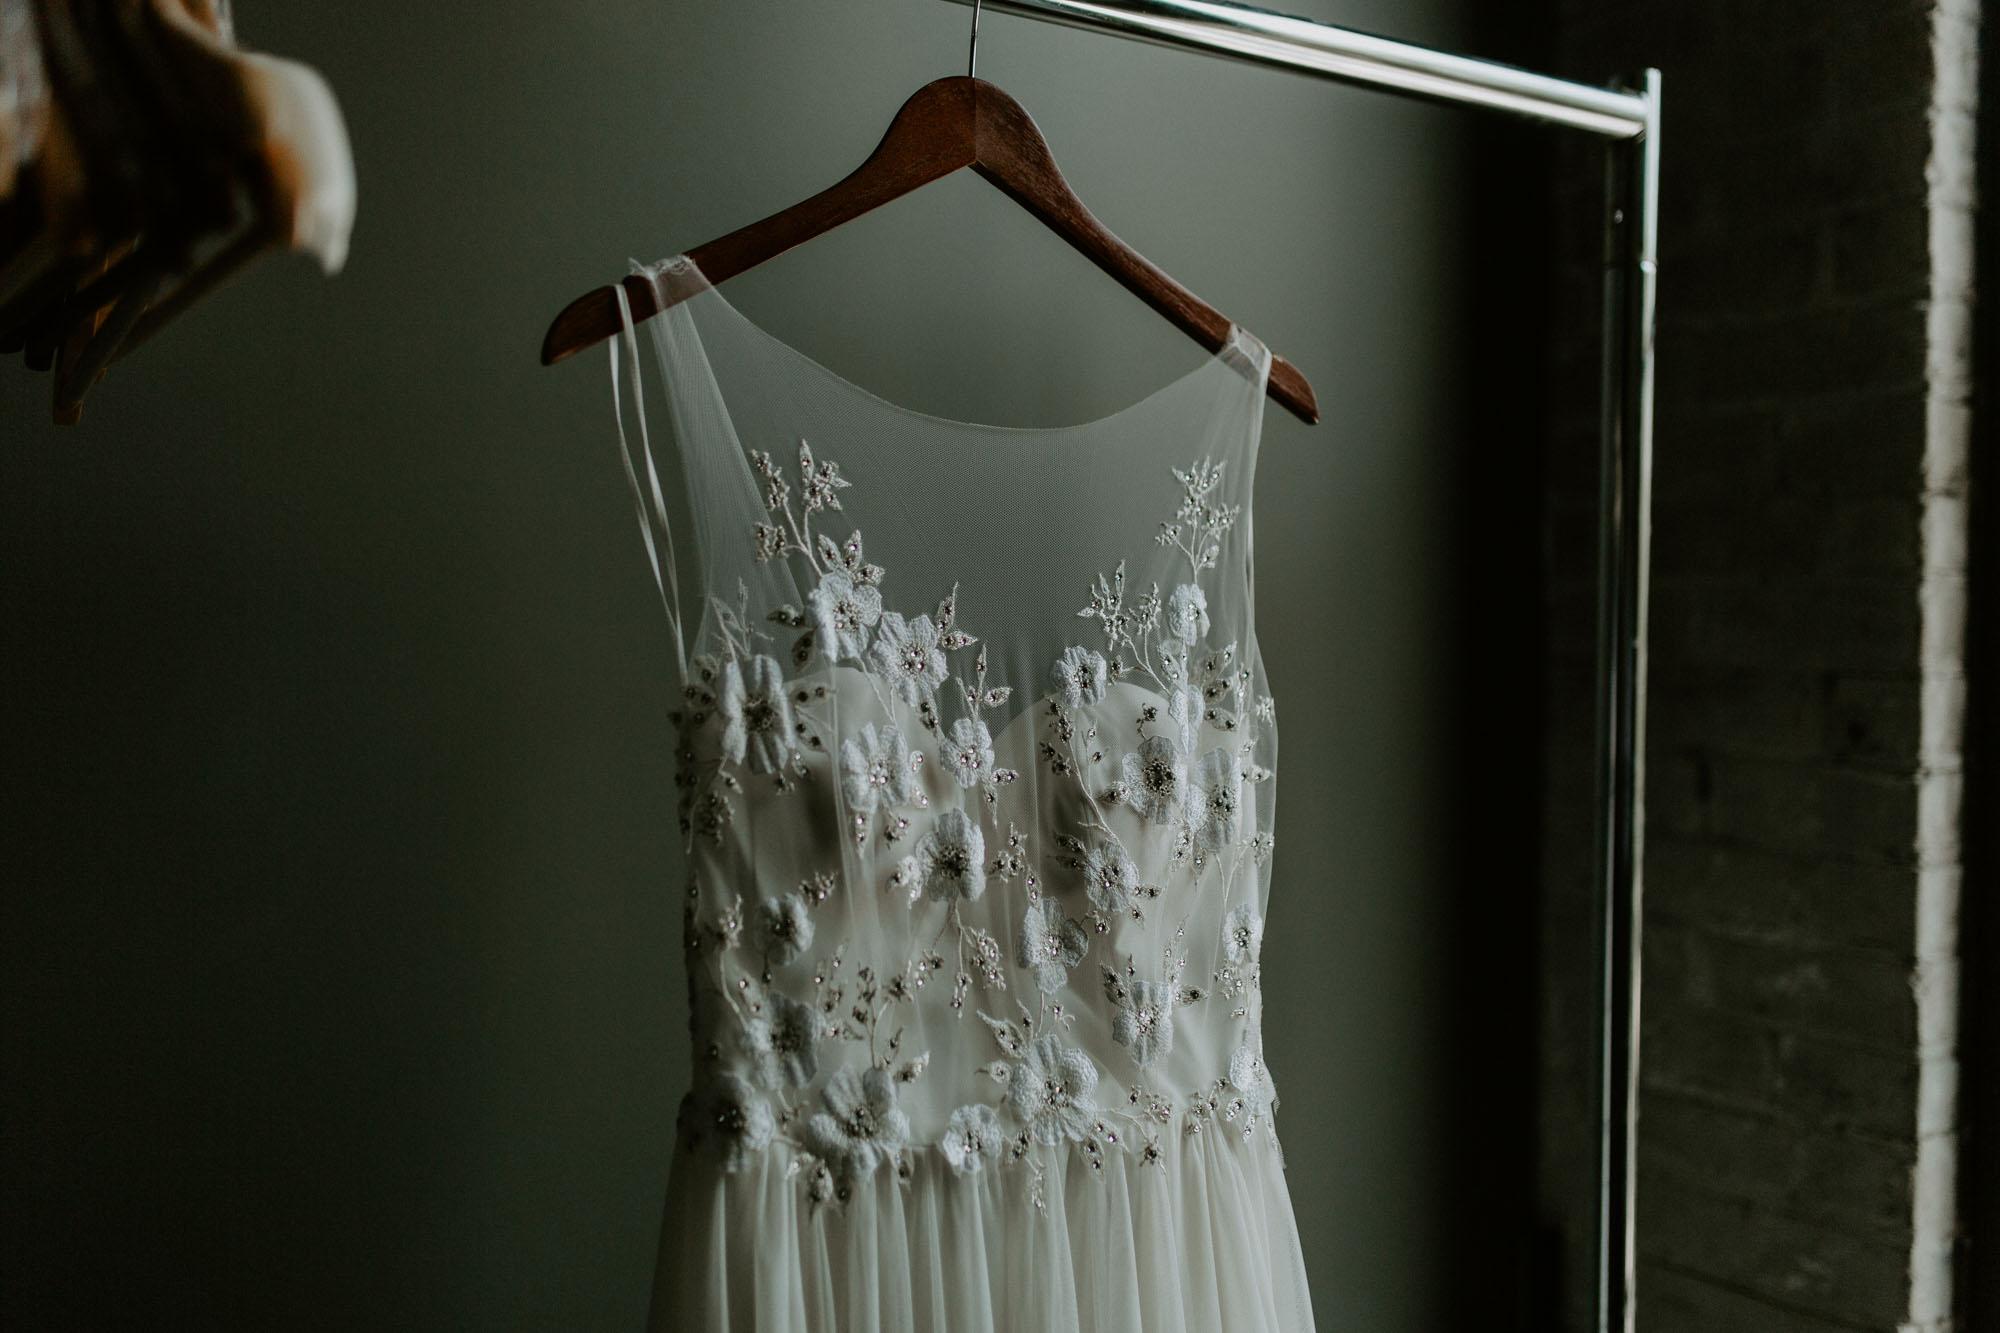 journeyman_distillery_wedding_photographer_chicago_il_wright_photographs-0630.jpg